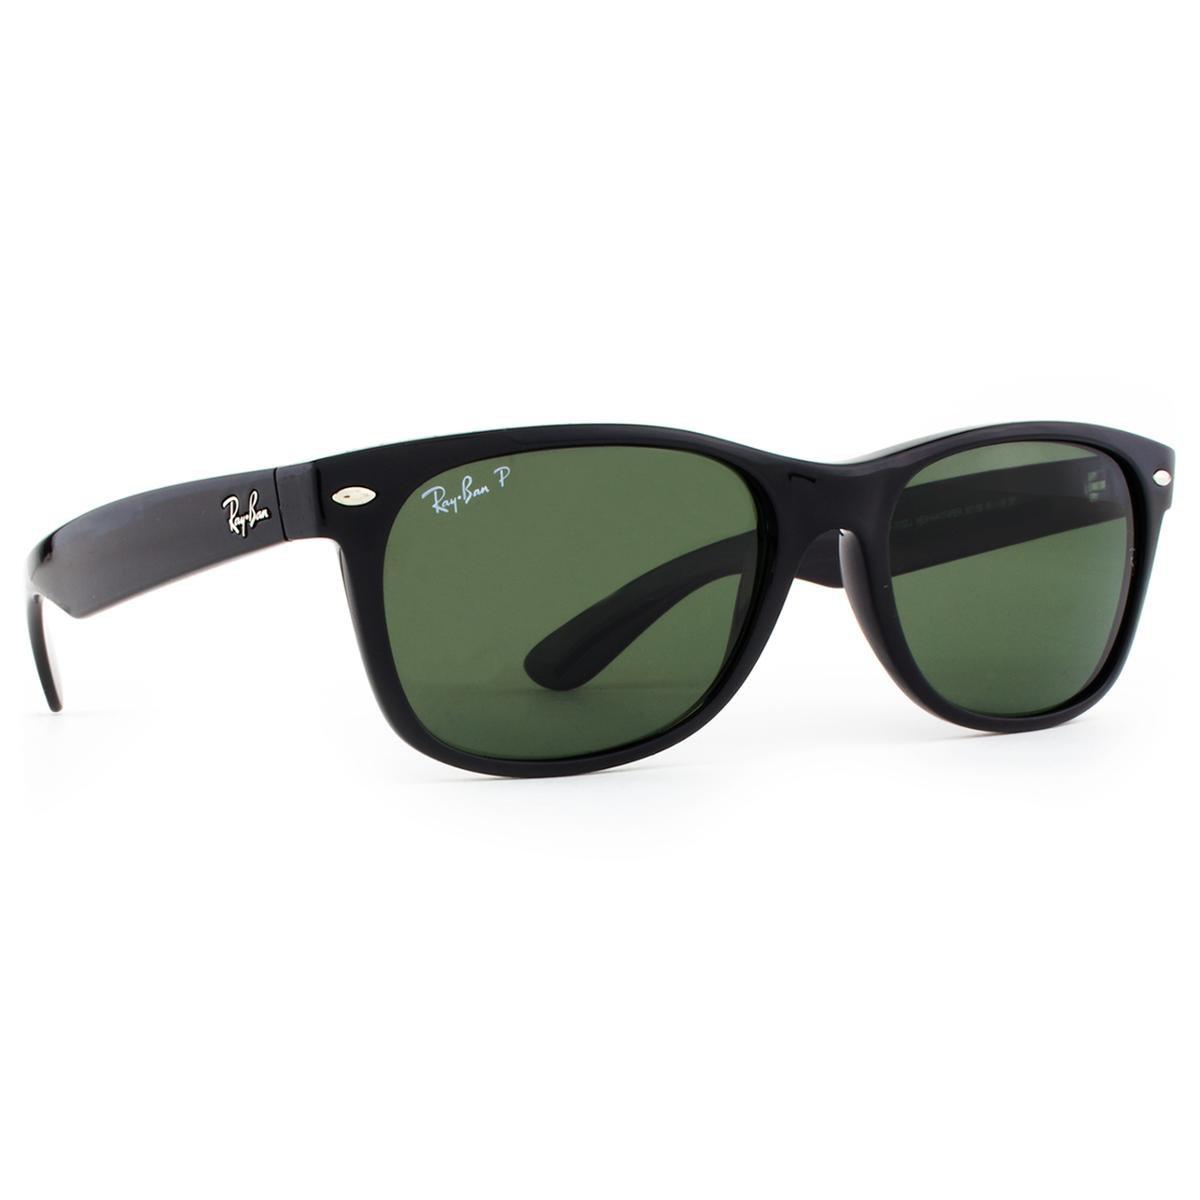 651e1e636d3 óculos Ray Ban New Wayfarer « One More Soul